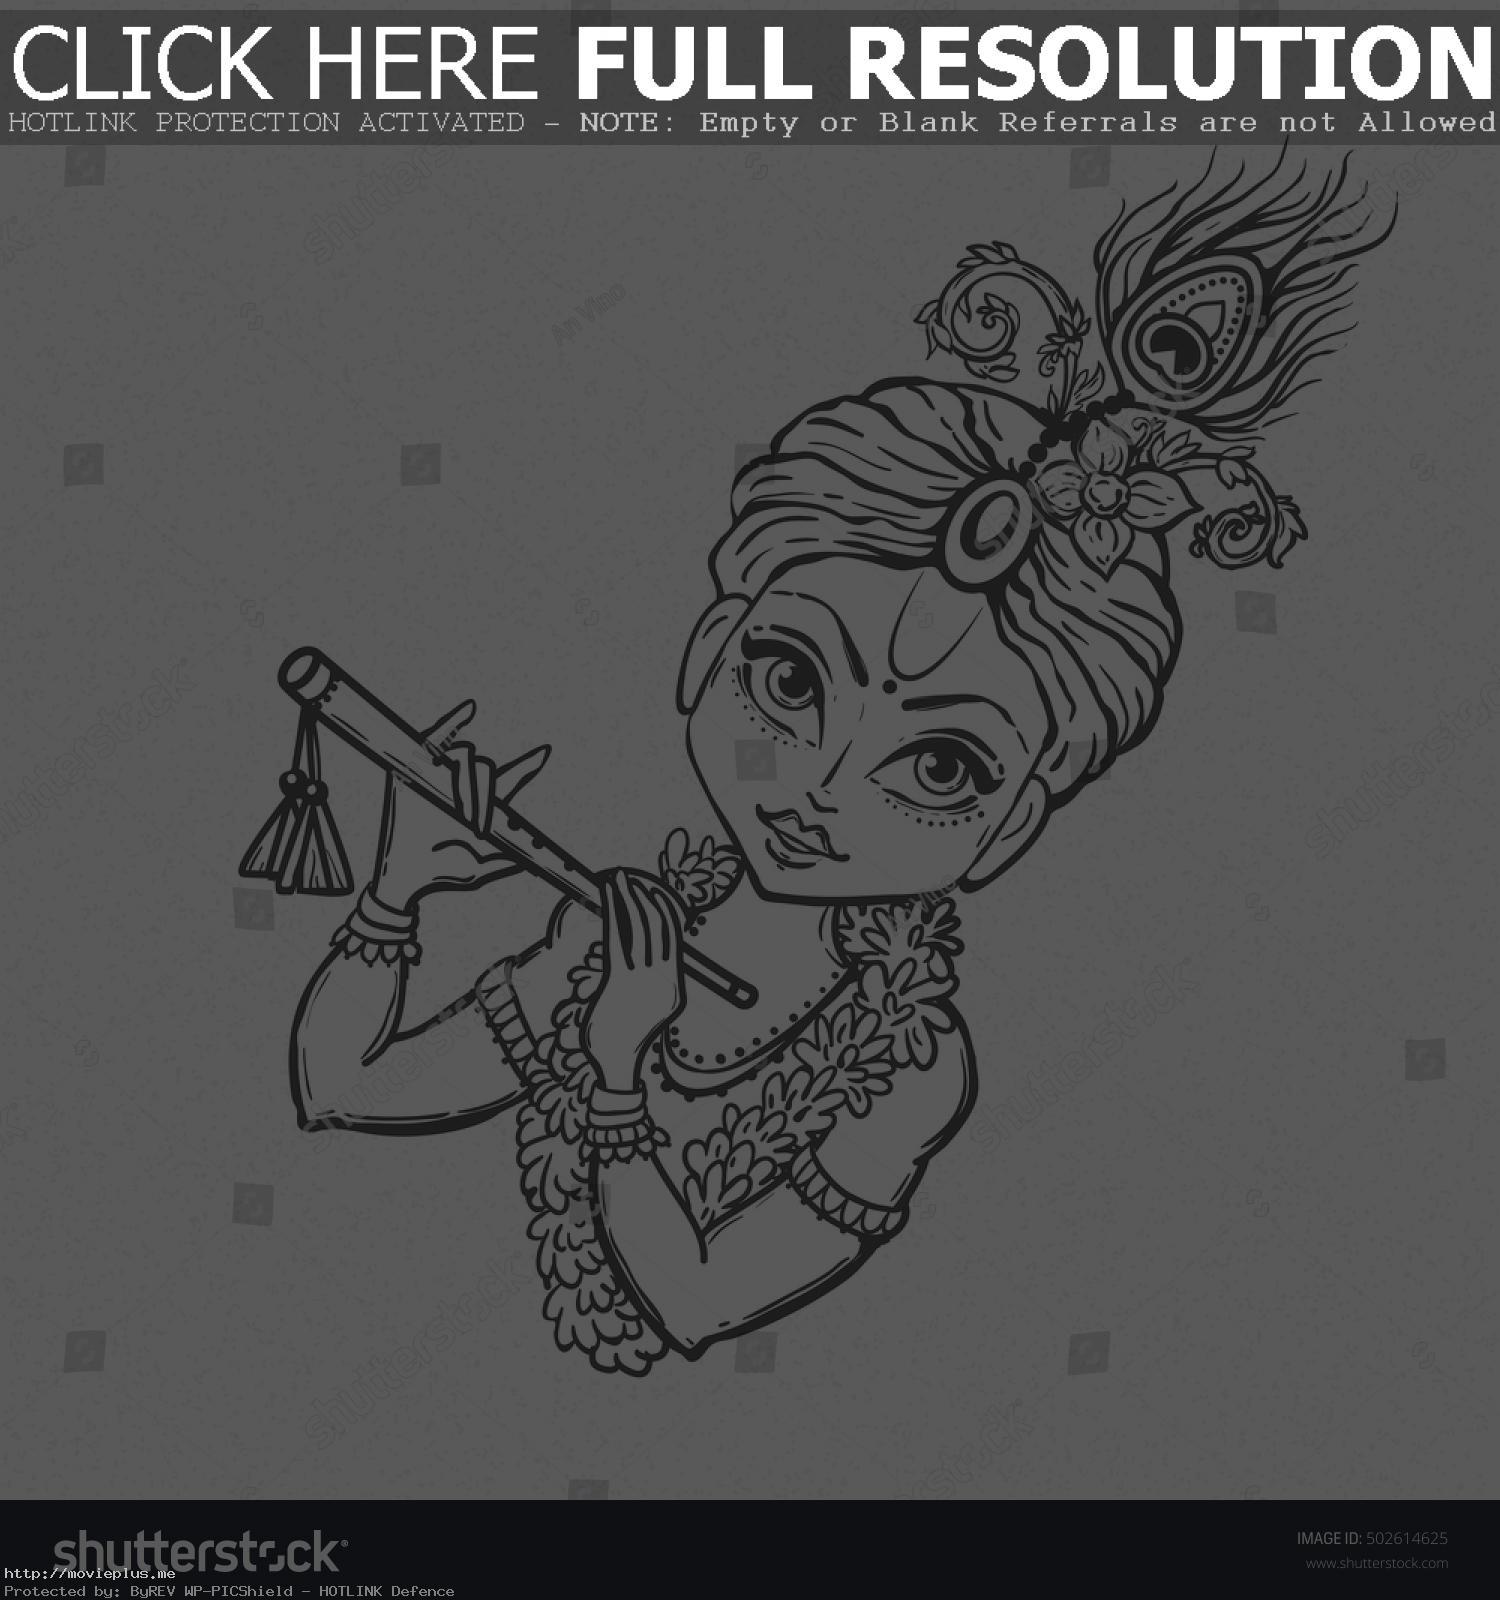 Flutes clipart lord krishna. Free flute download clip